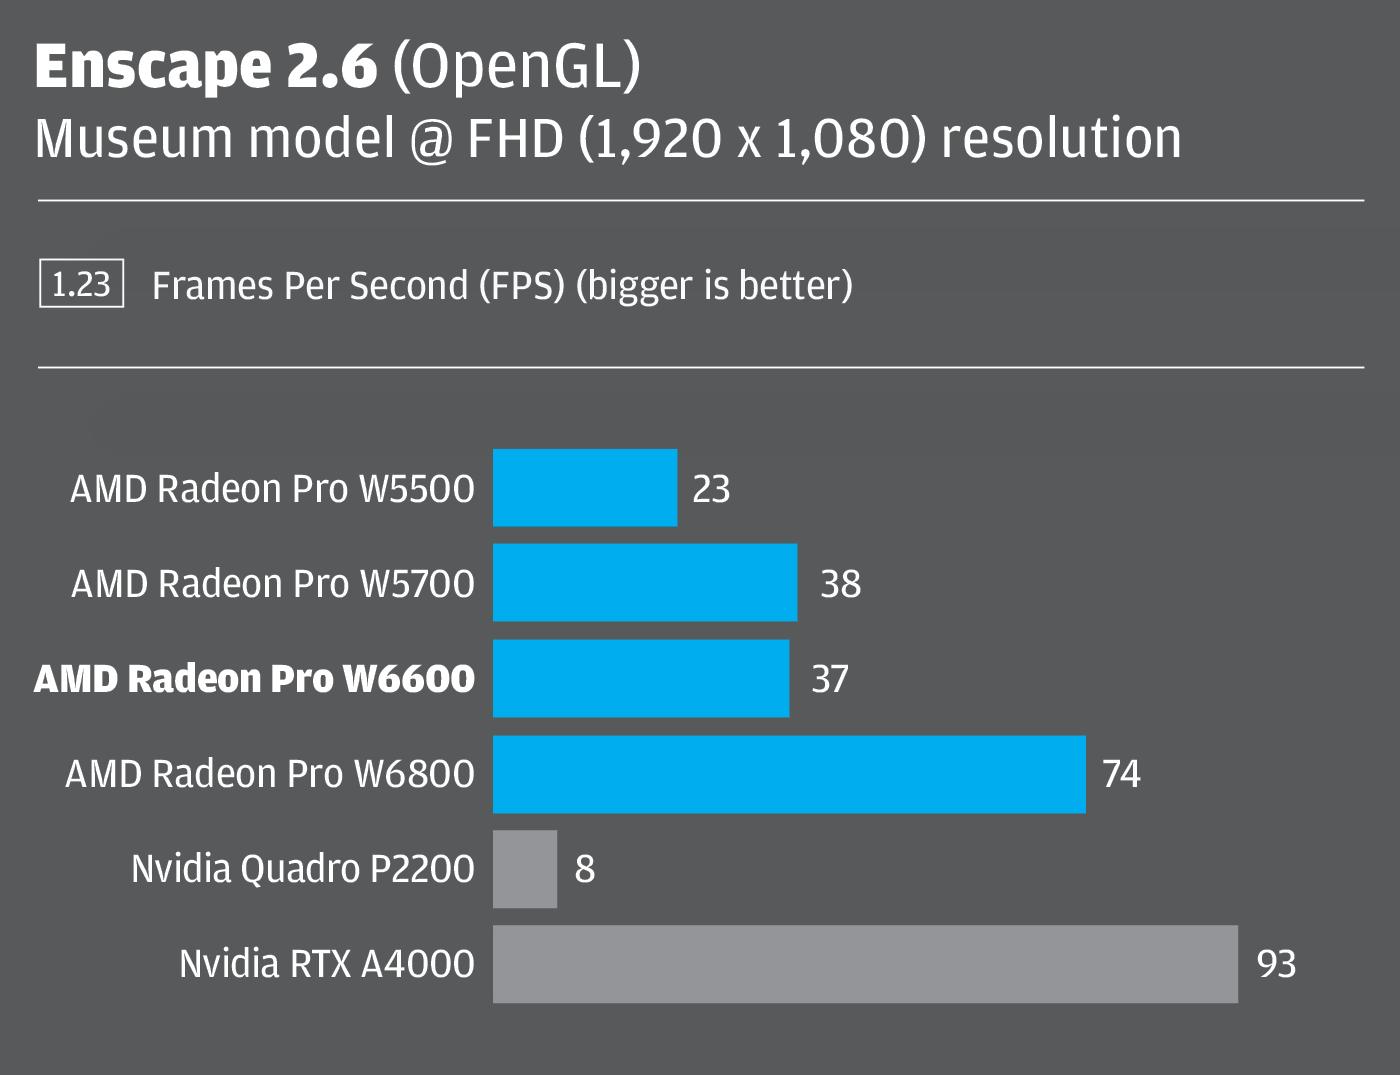 Radeon Pro W6600 Enscape